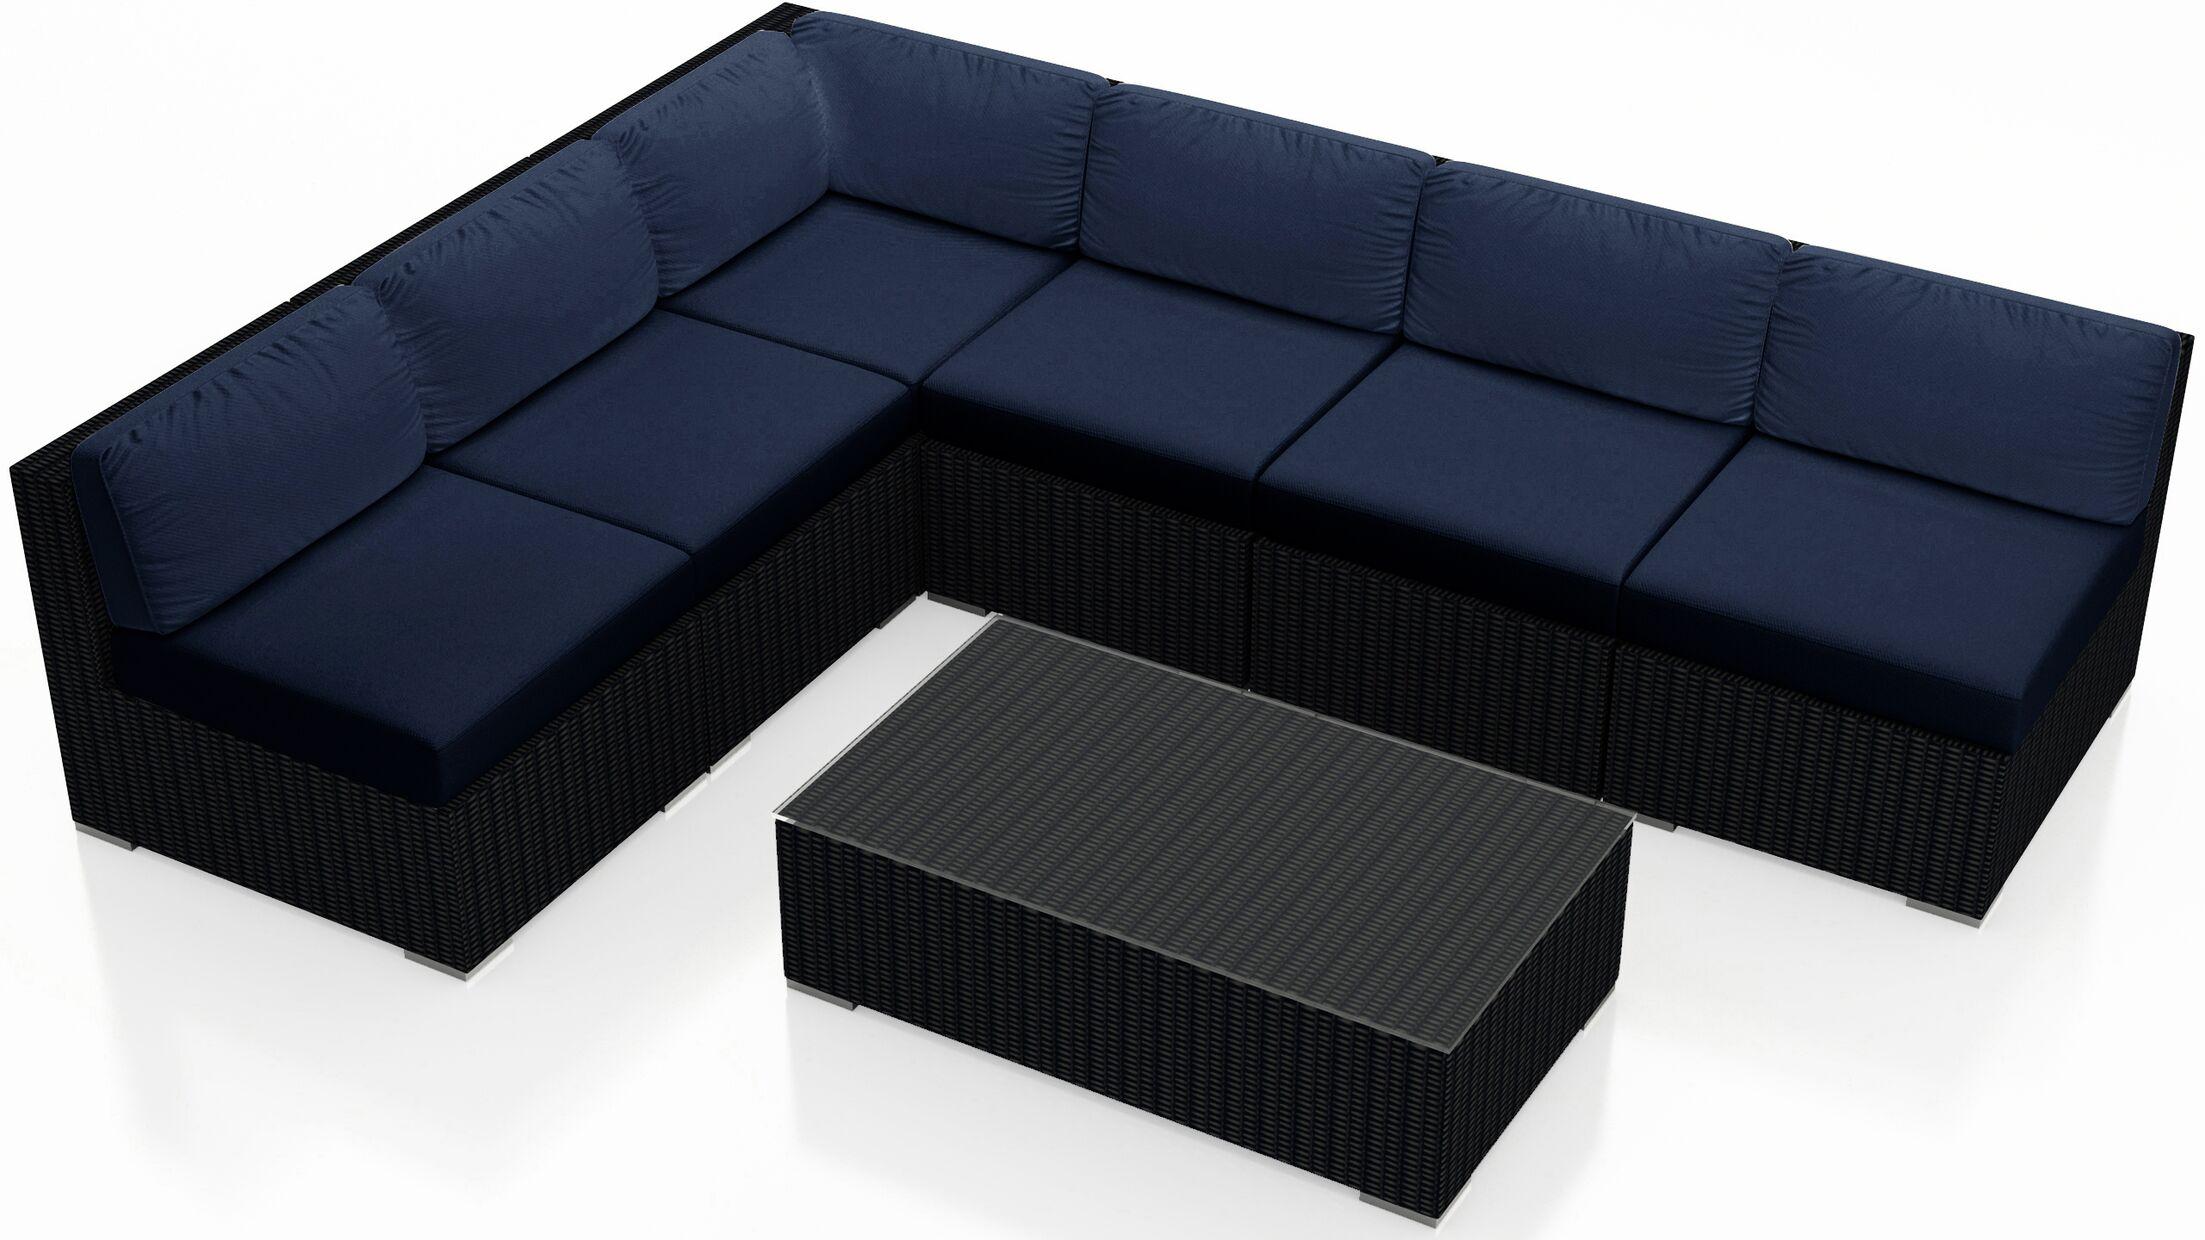 Urbana 7 Piece Sectional Set with Cushions Fabric: Indigo